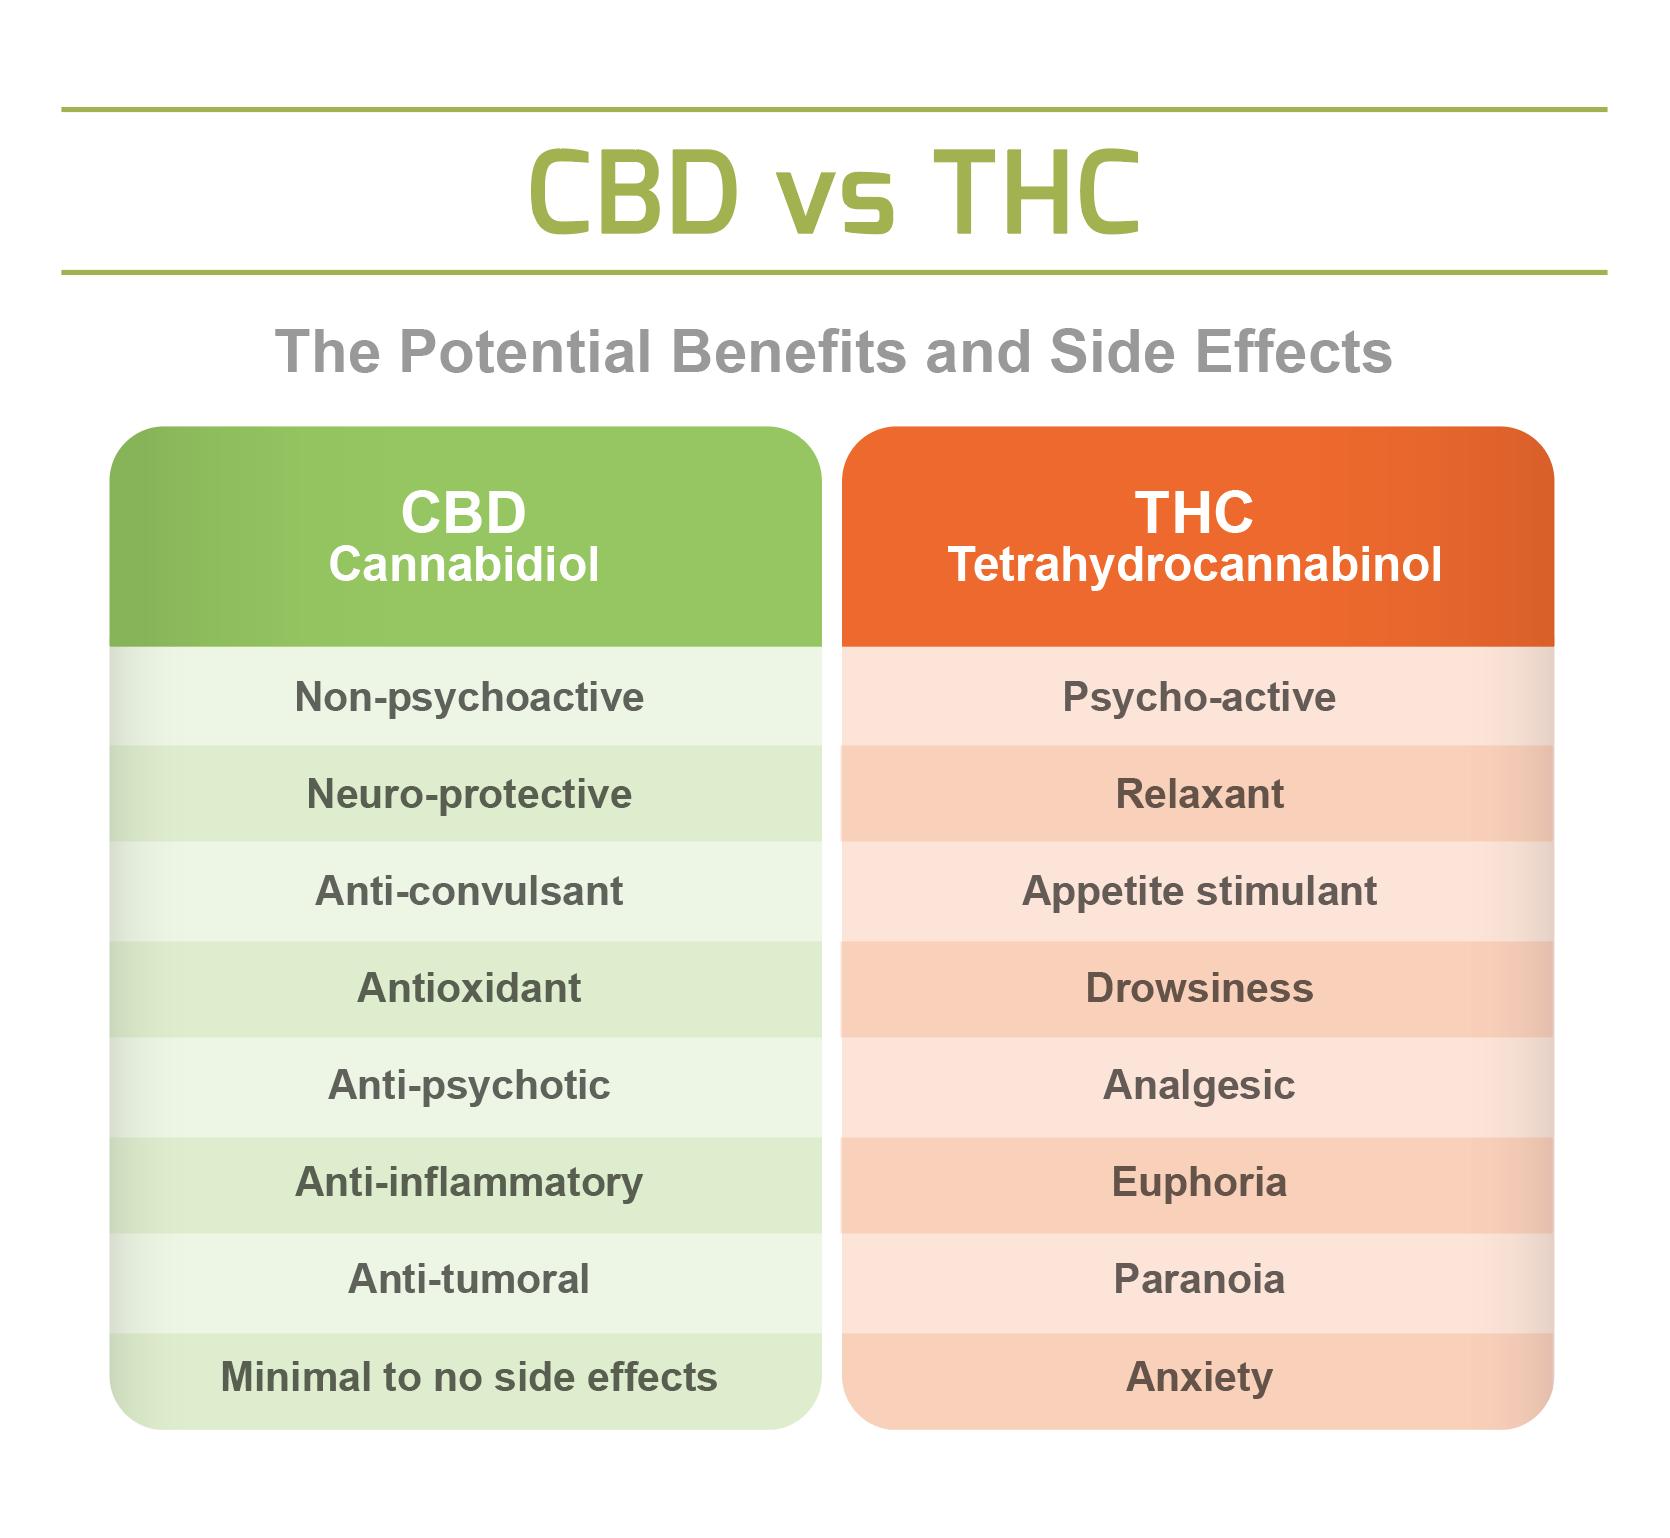 Figure 1. Advantages and disadvantages of CBD and THC. Source: https://www.endoca.com/